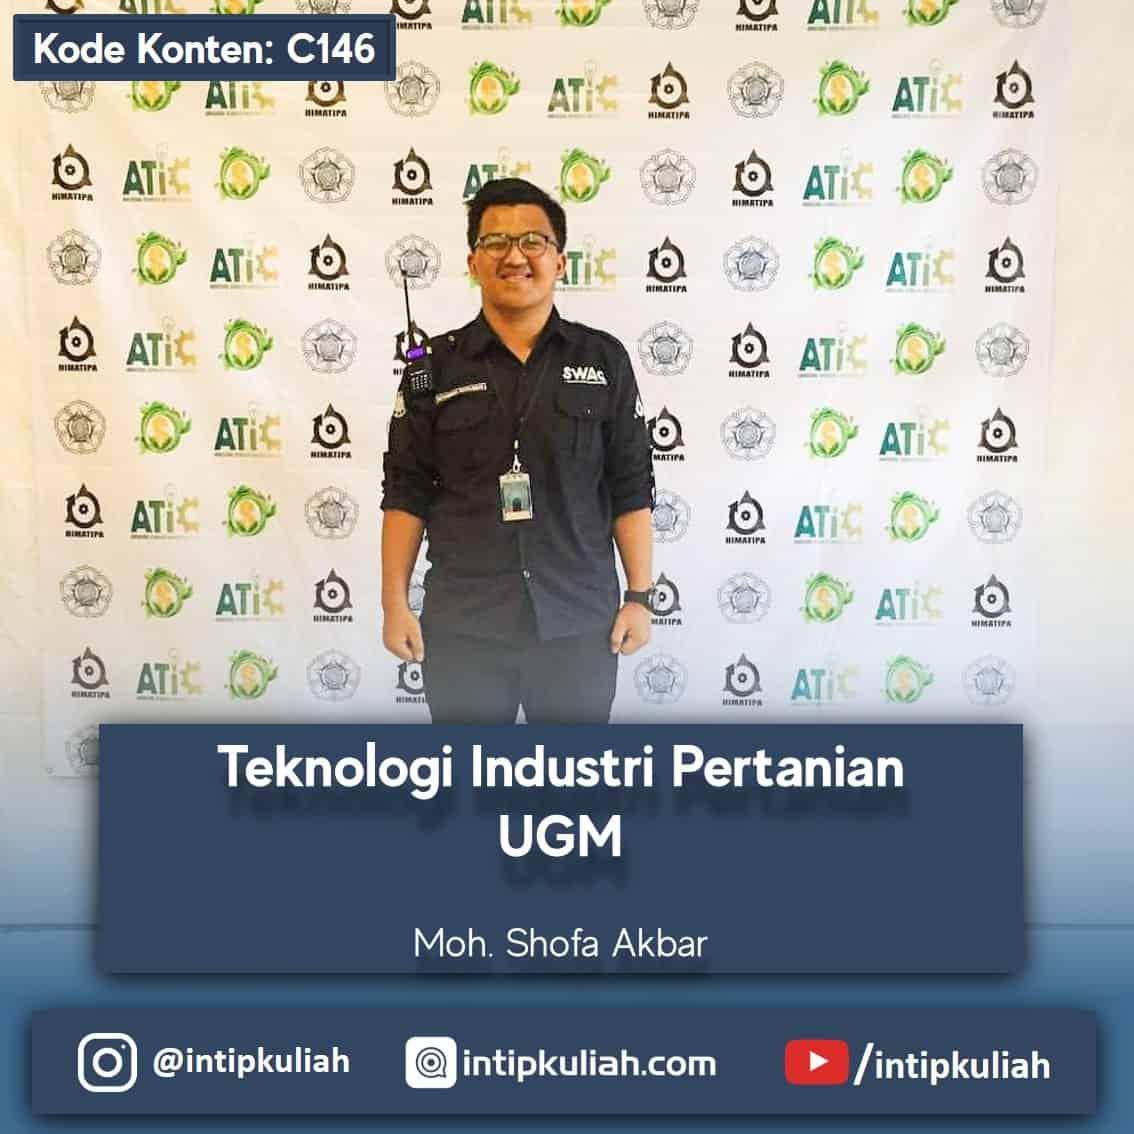 Teknologi Industri Pertanian UGM (Akbar)